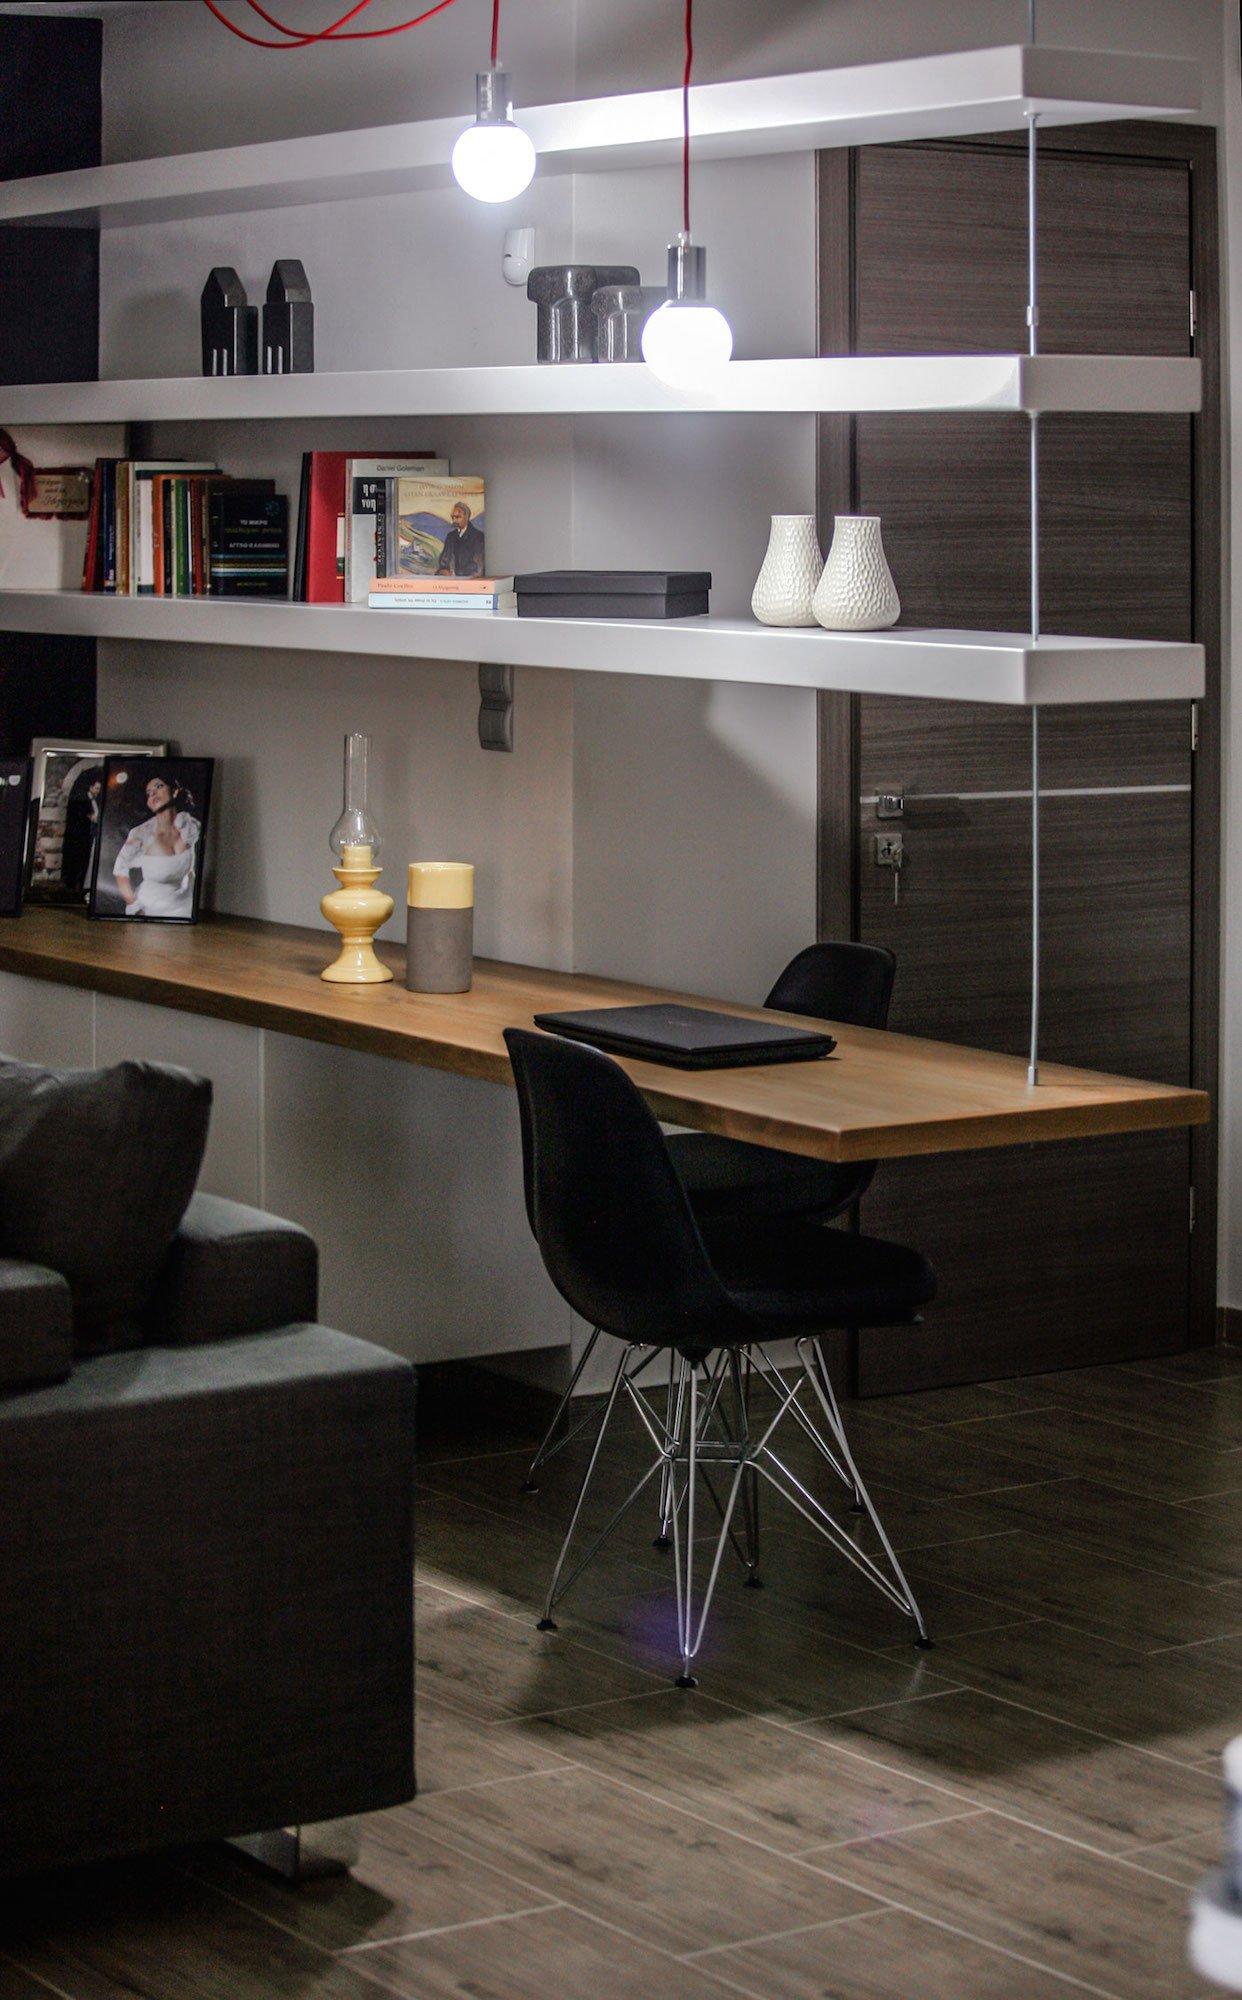 A-Stylish-Apartment-in-Heraklion-03